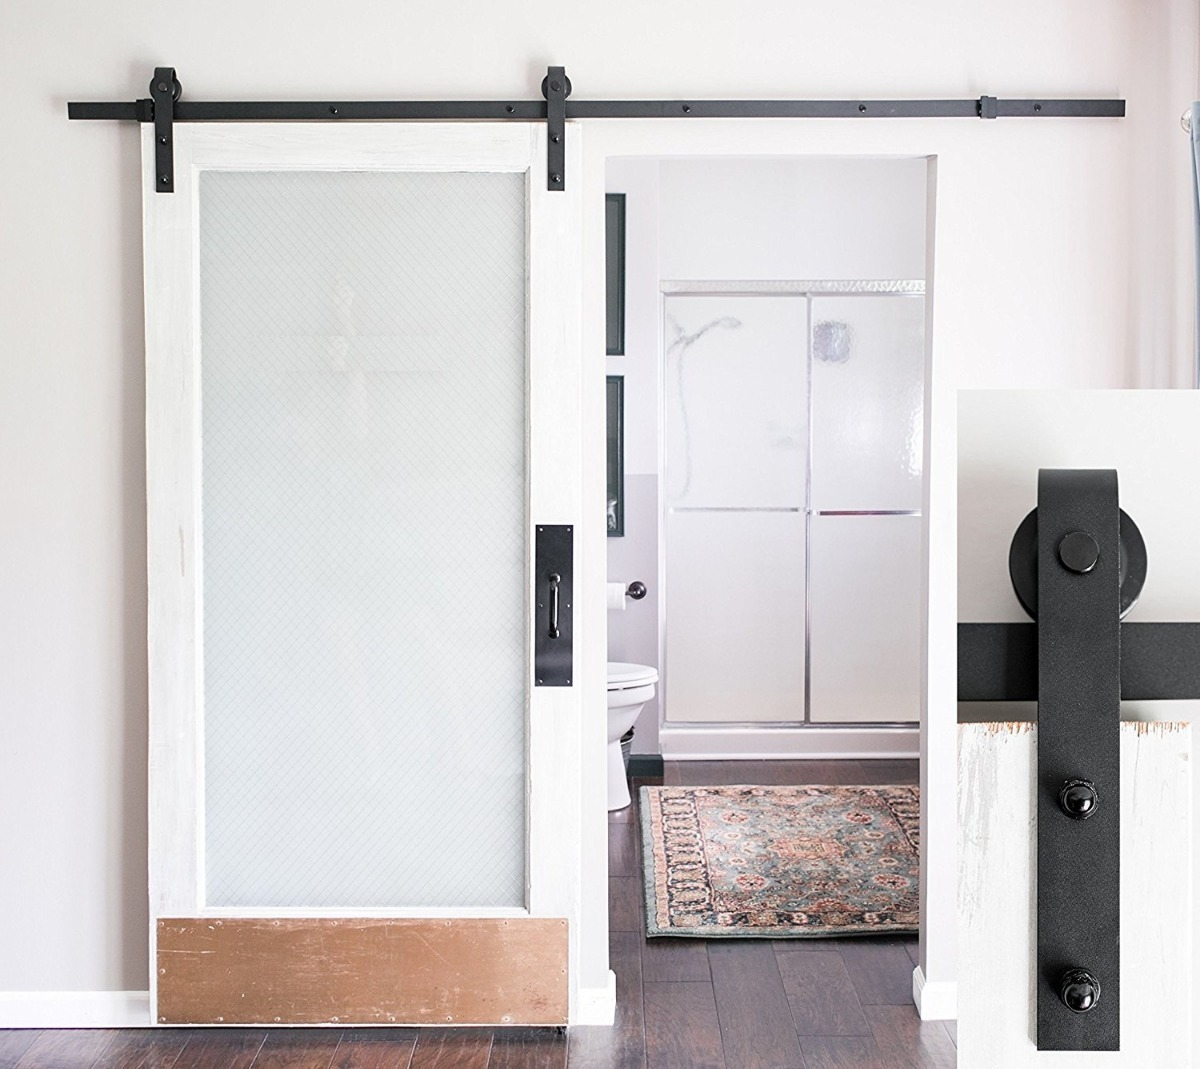 Kit riel para puerta corrediza 8pies ultra silencioso for Riel para puerta corrediza